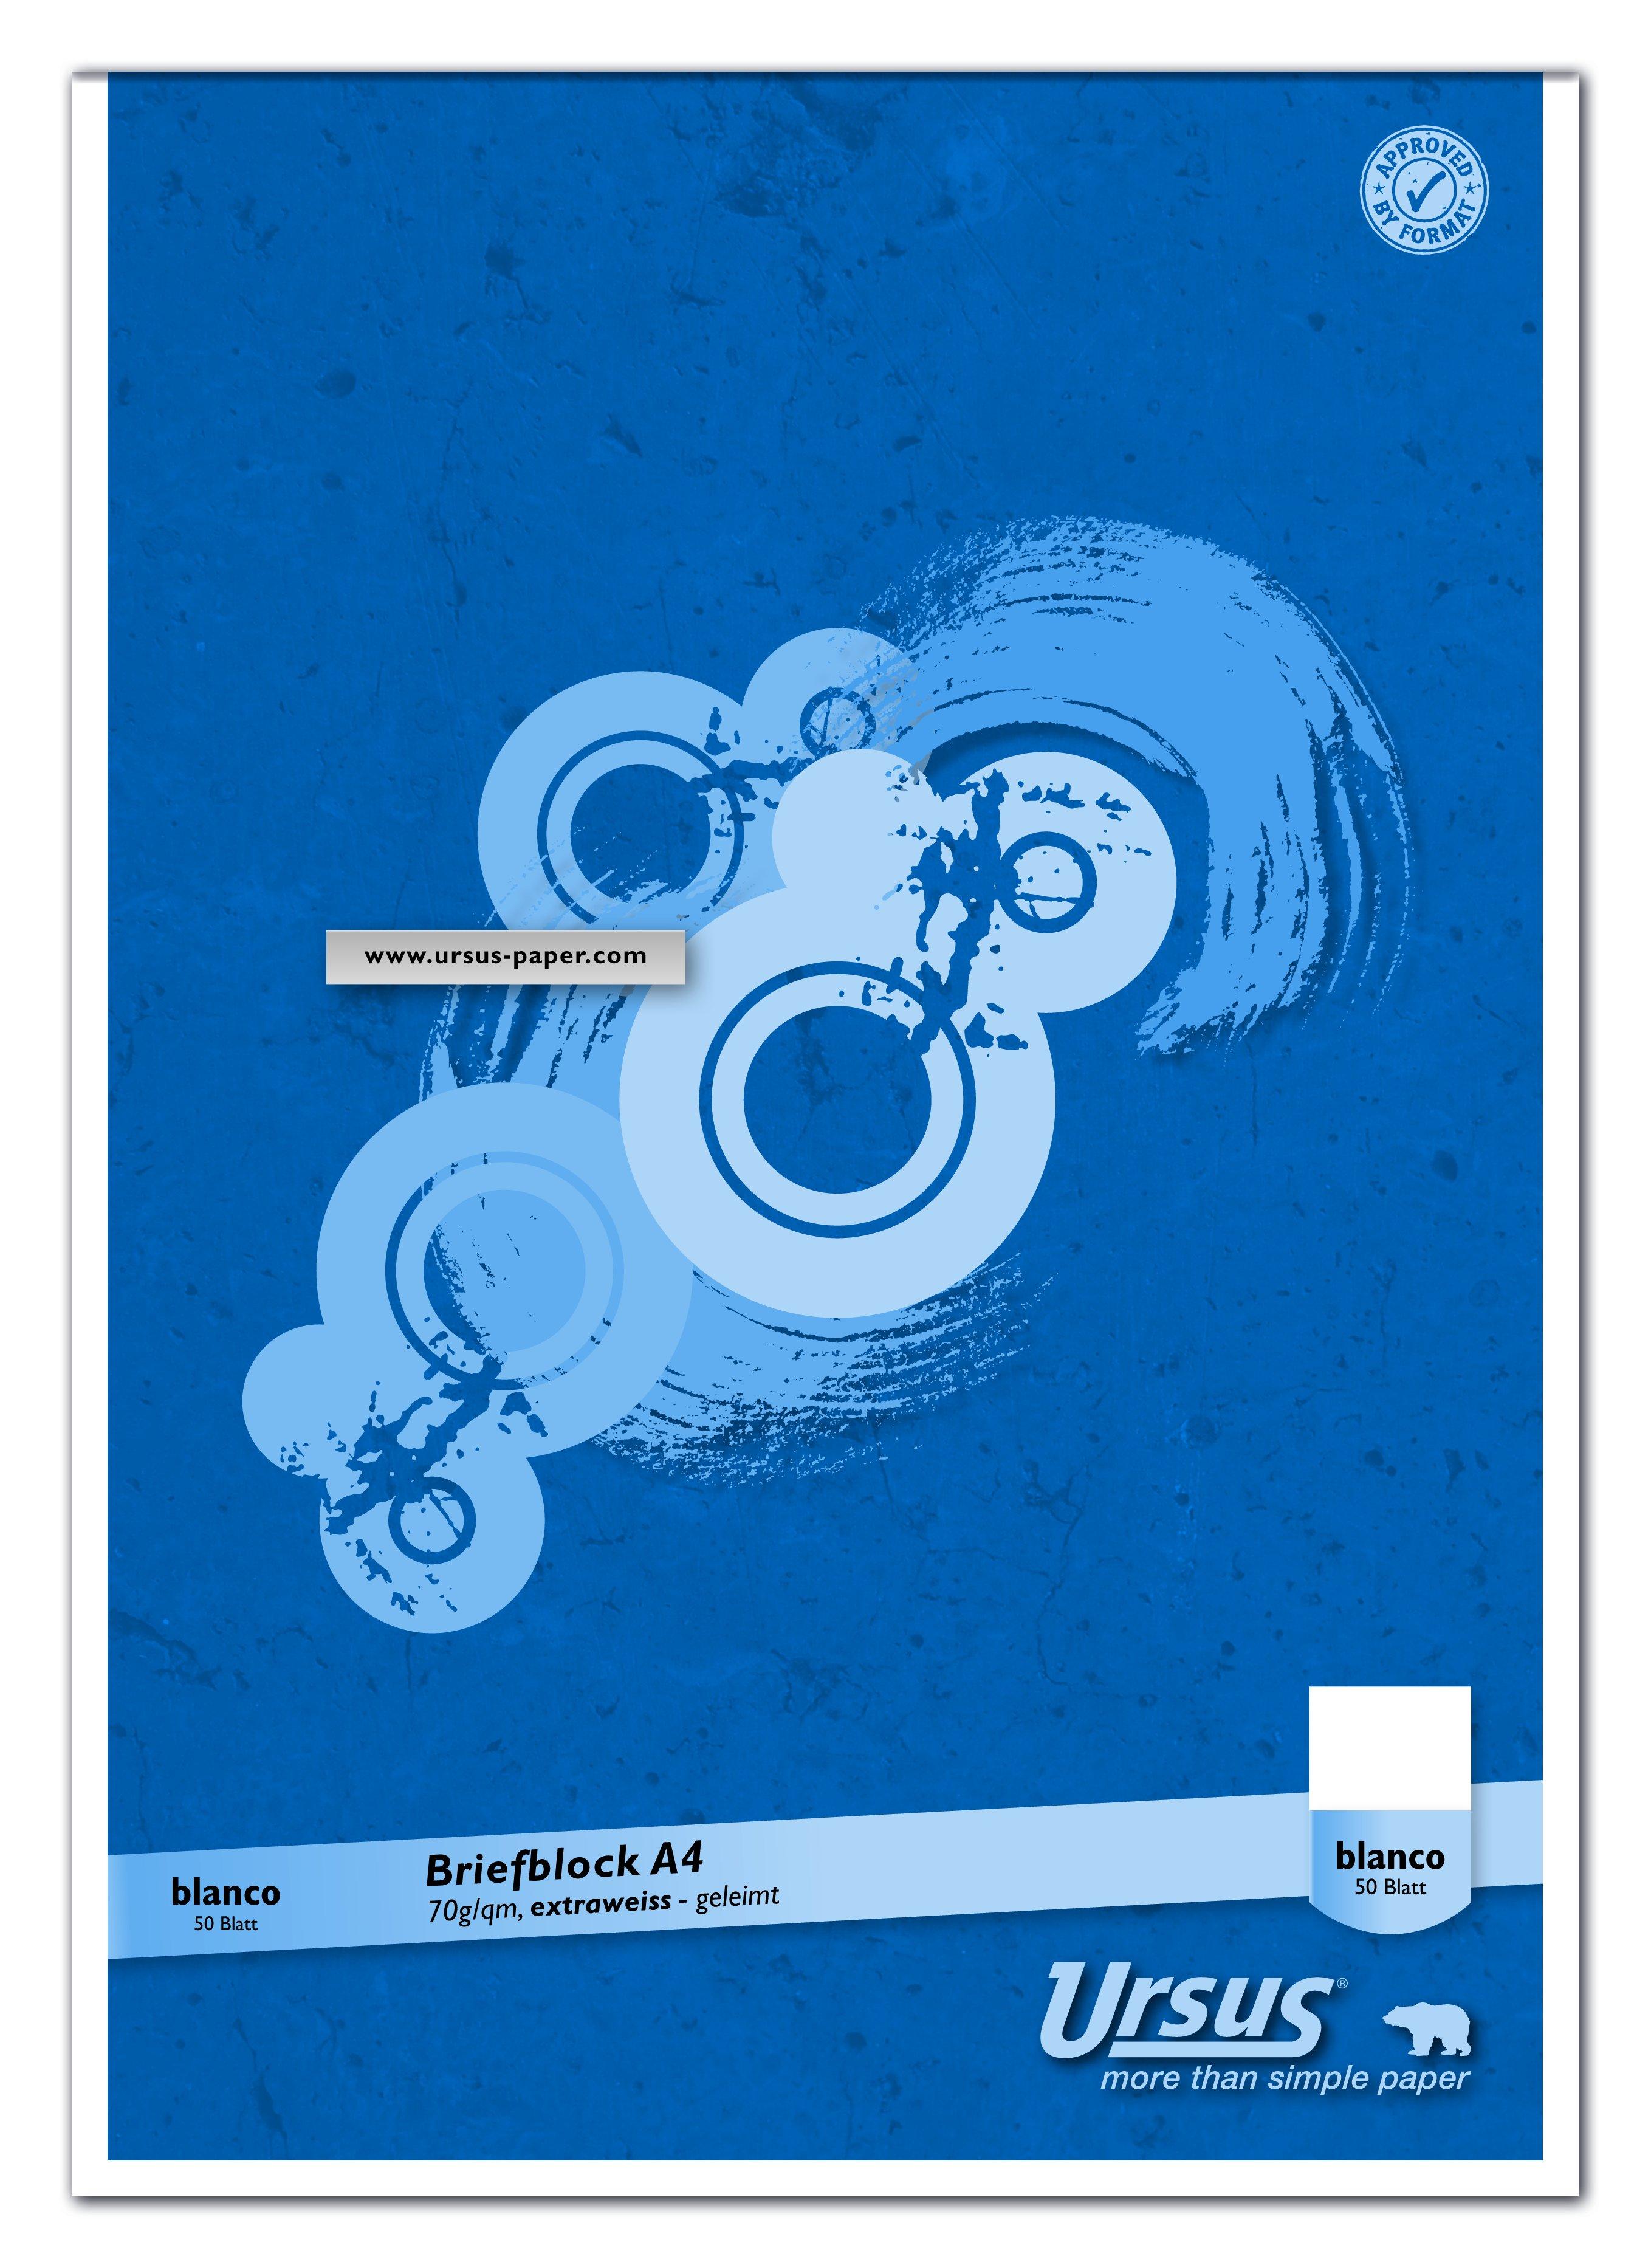 Briefblock DIN A4 blanko 50 Blatt